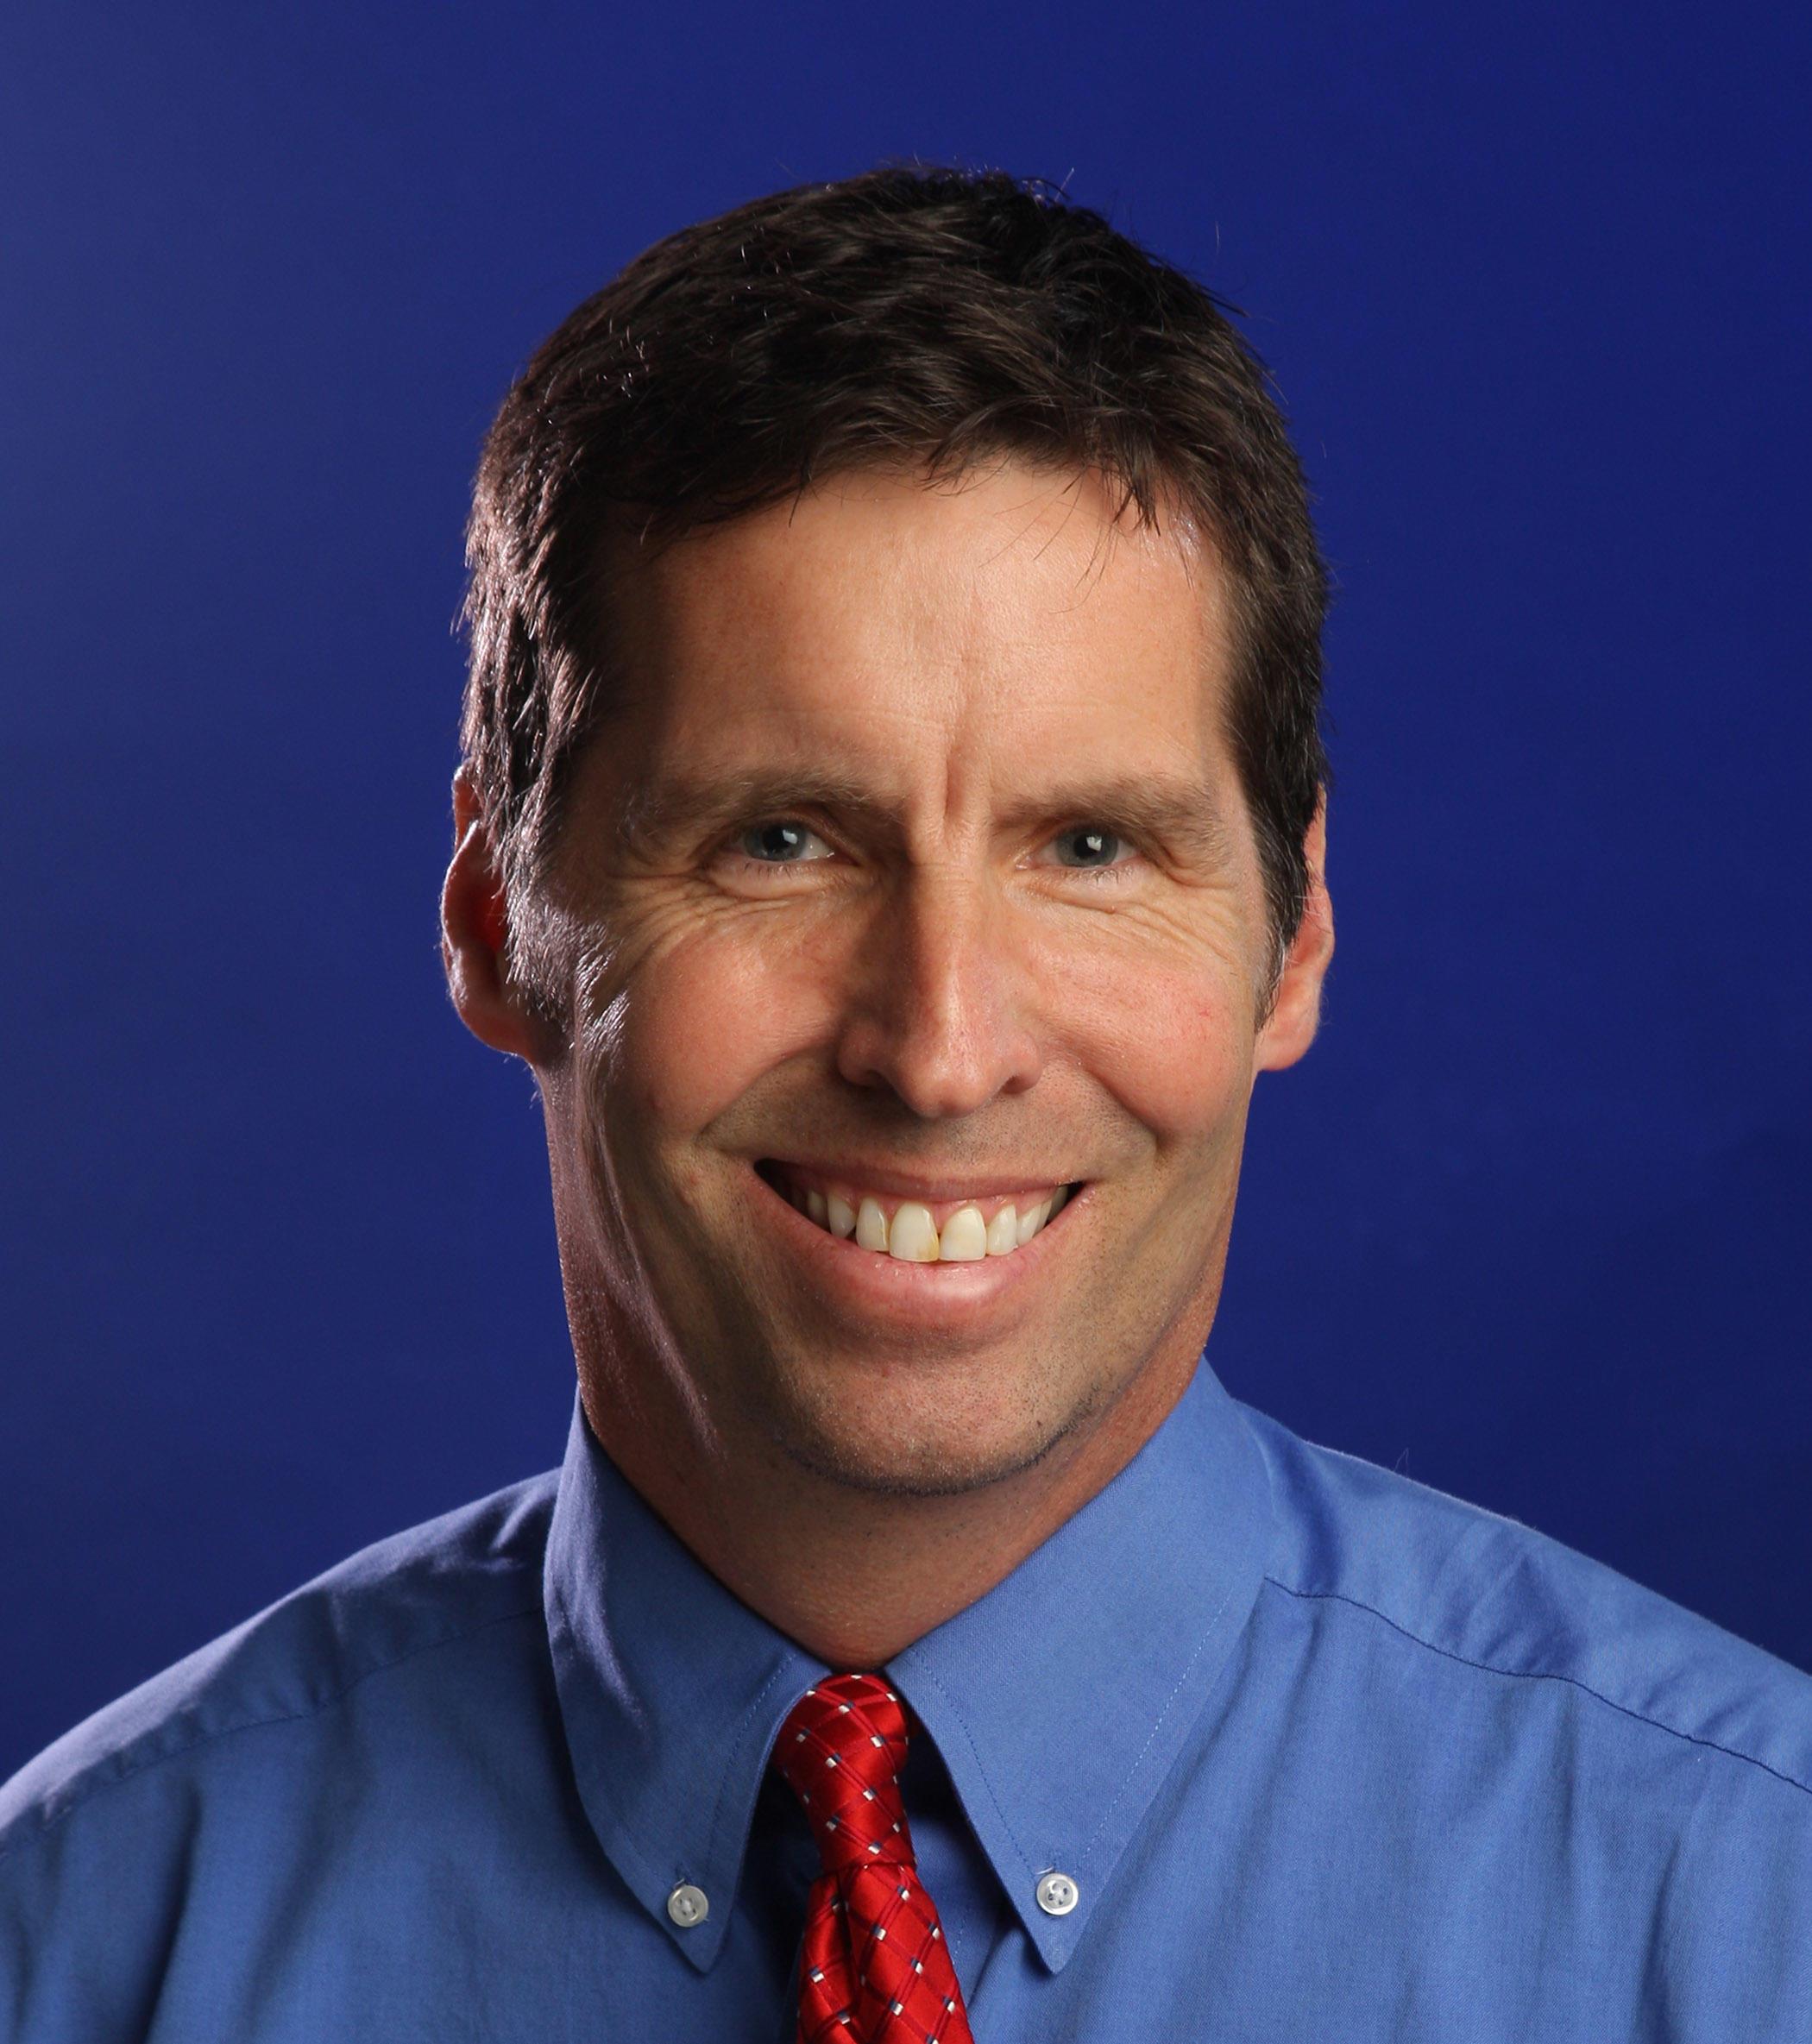 All State Quote: Car Insurance In Mill Creek, WA - Jeff Zulfer